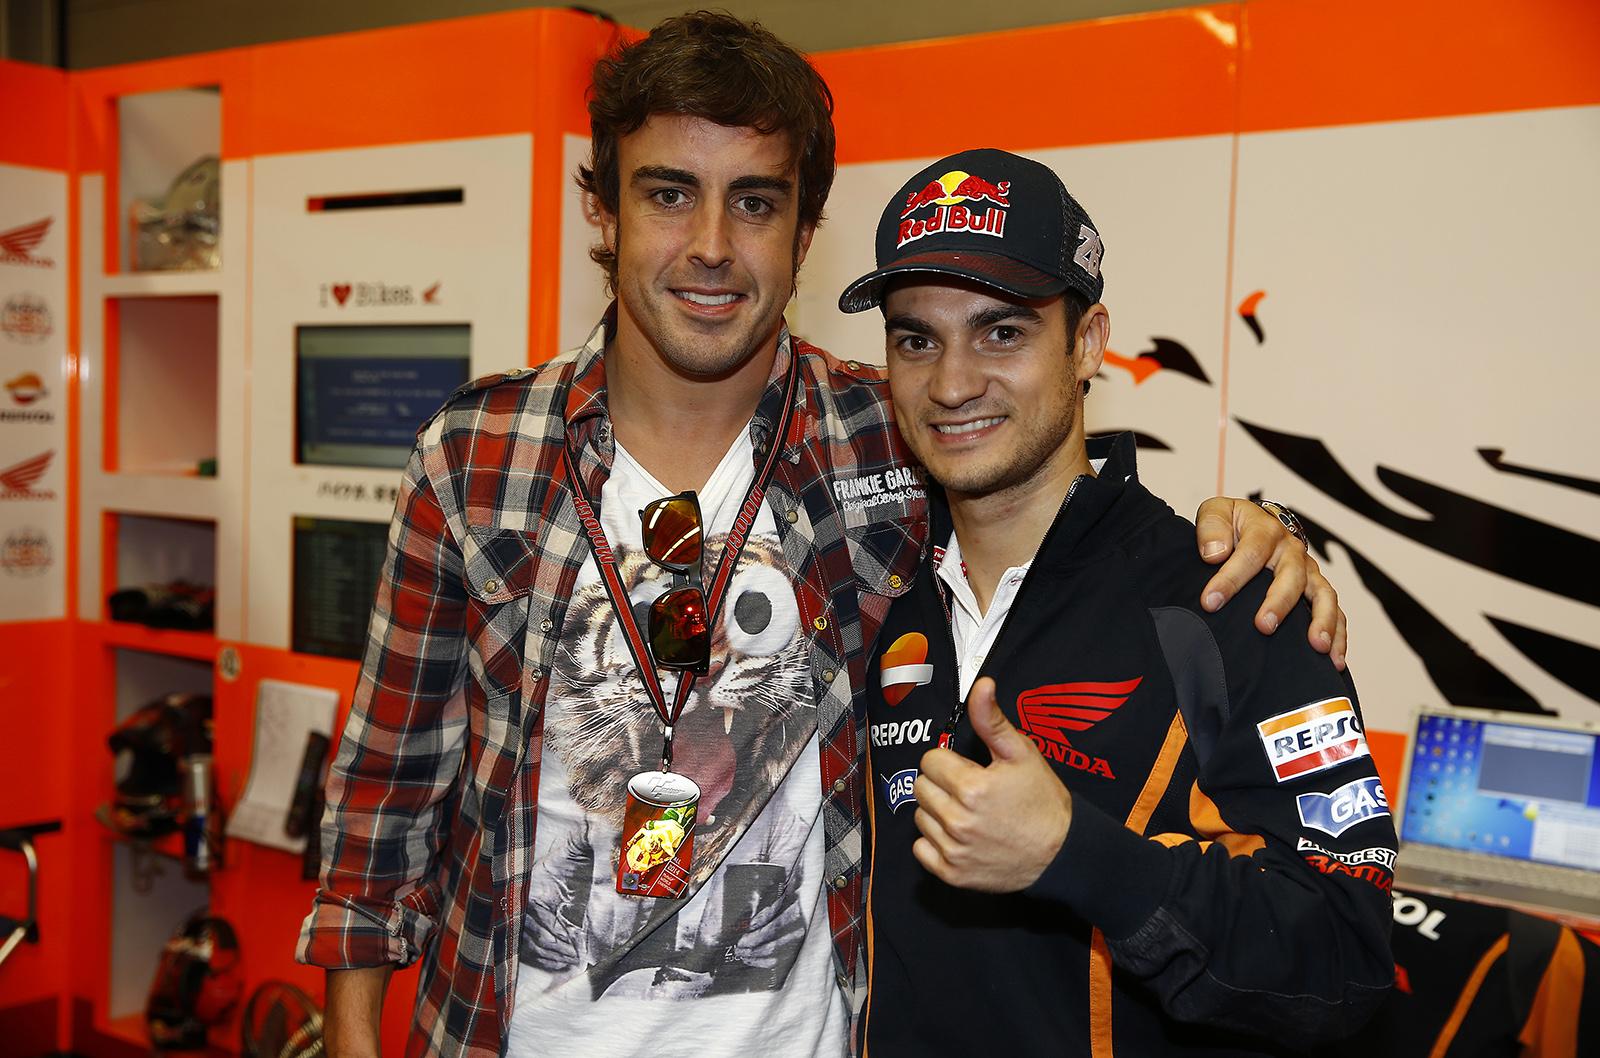 ¿Cuánto mide Fernando Alonso? - Altura - Real height 4_tcm7-719857